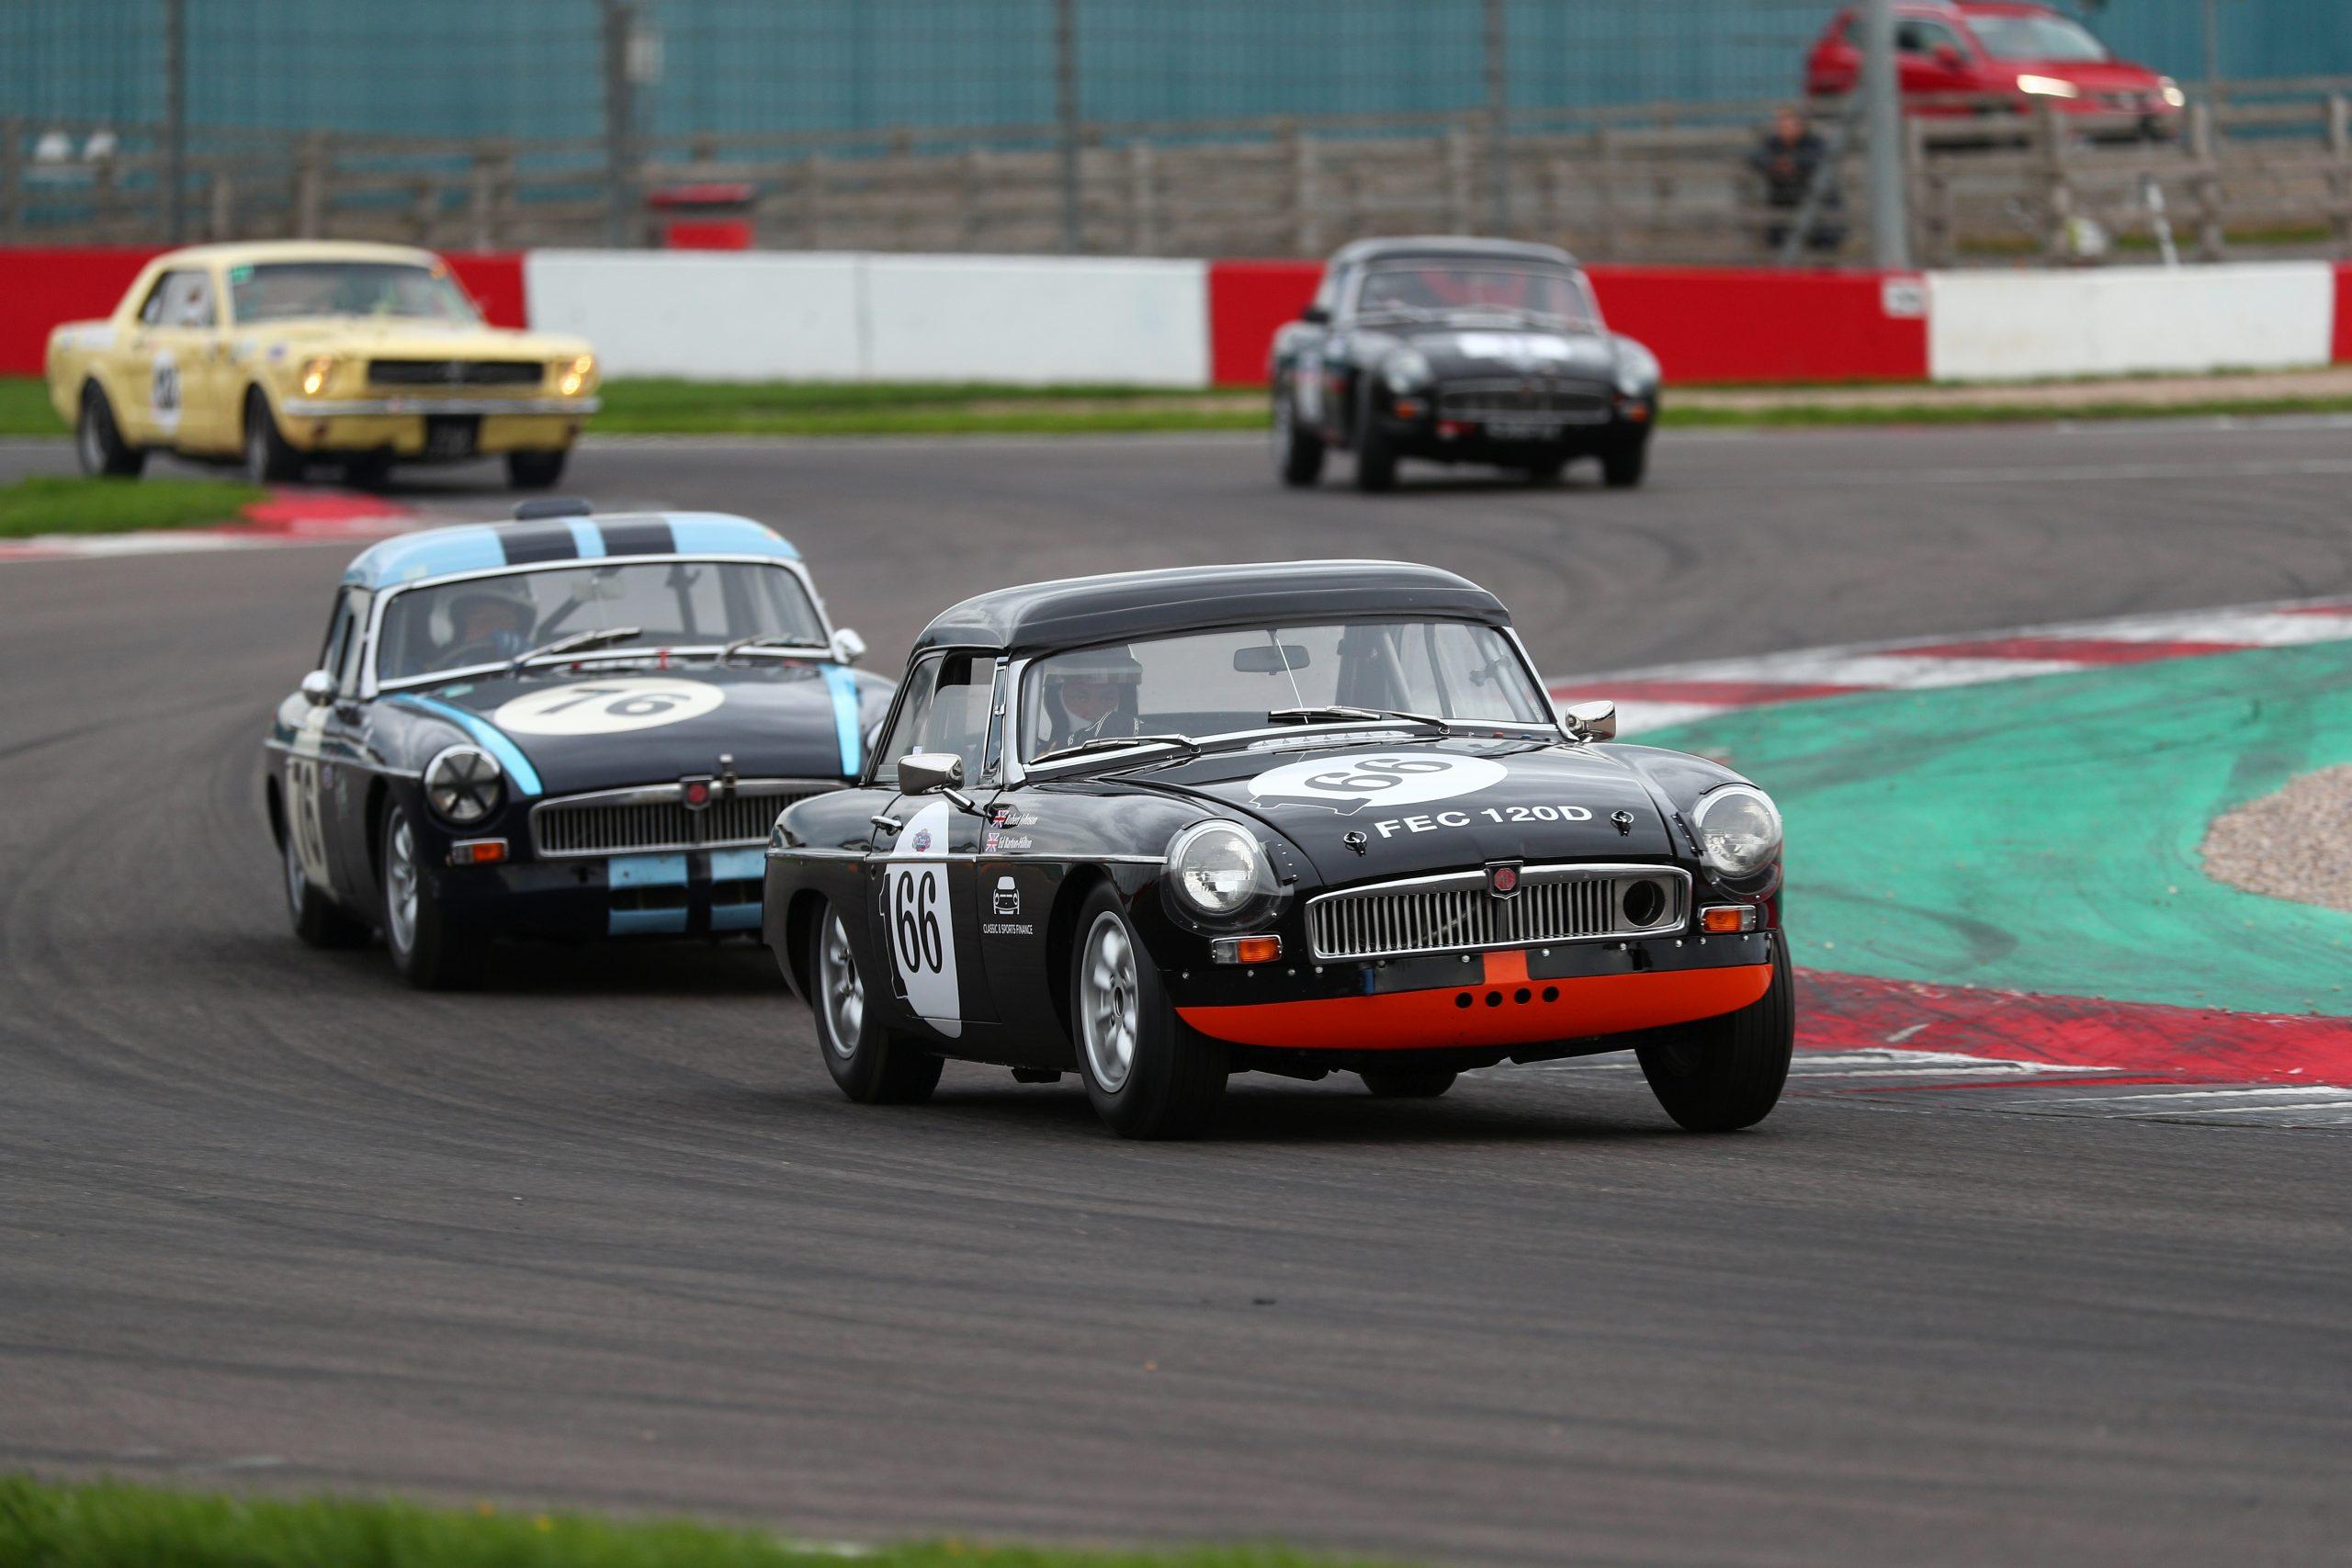 MGB Race Car Silverstone